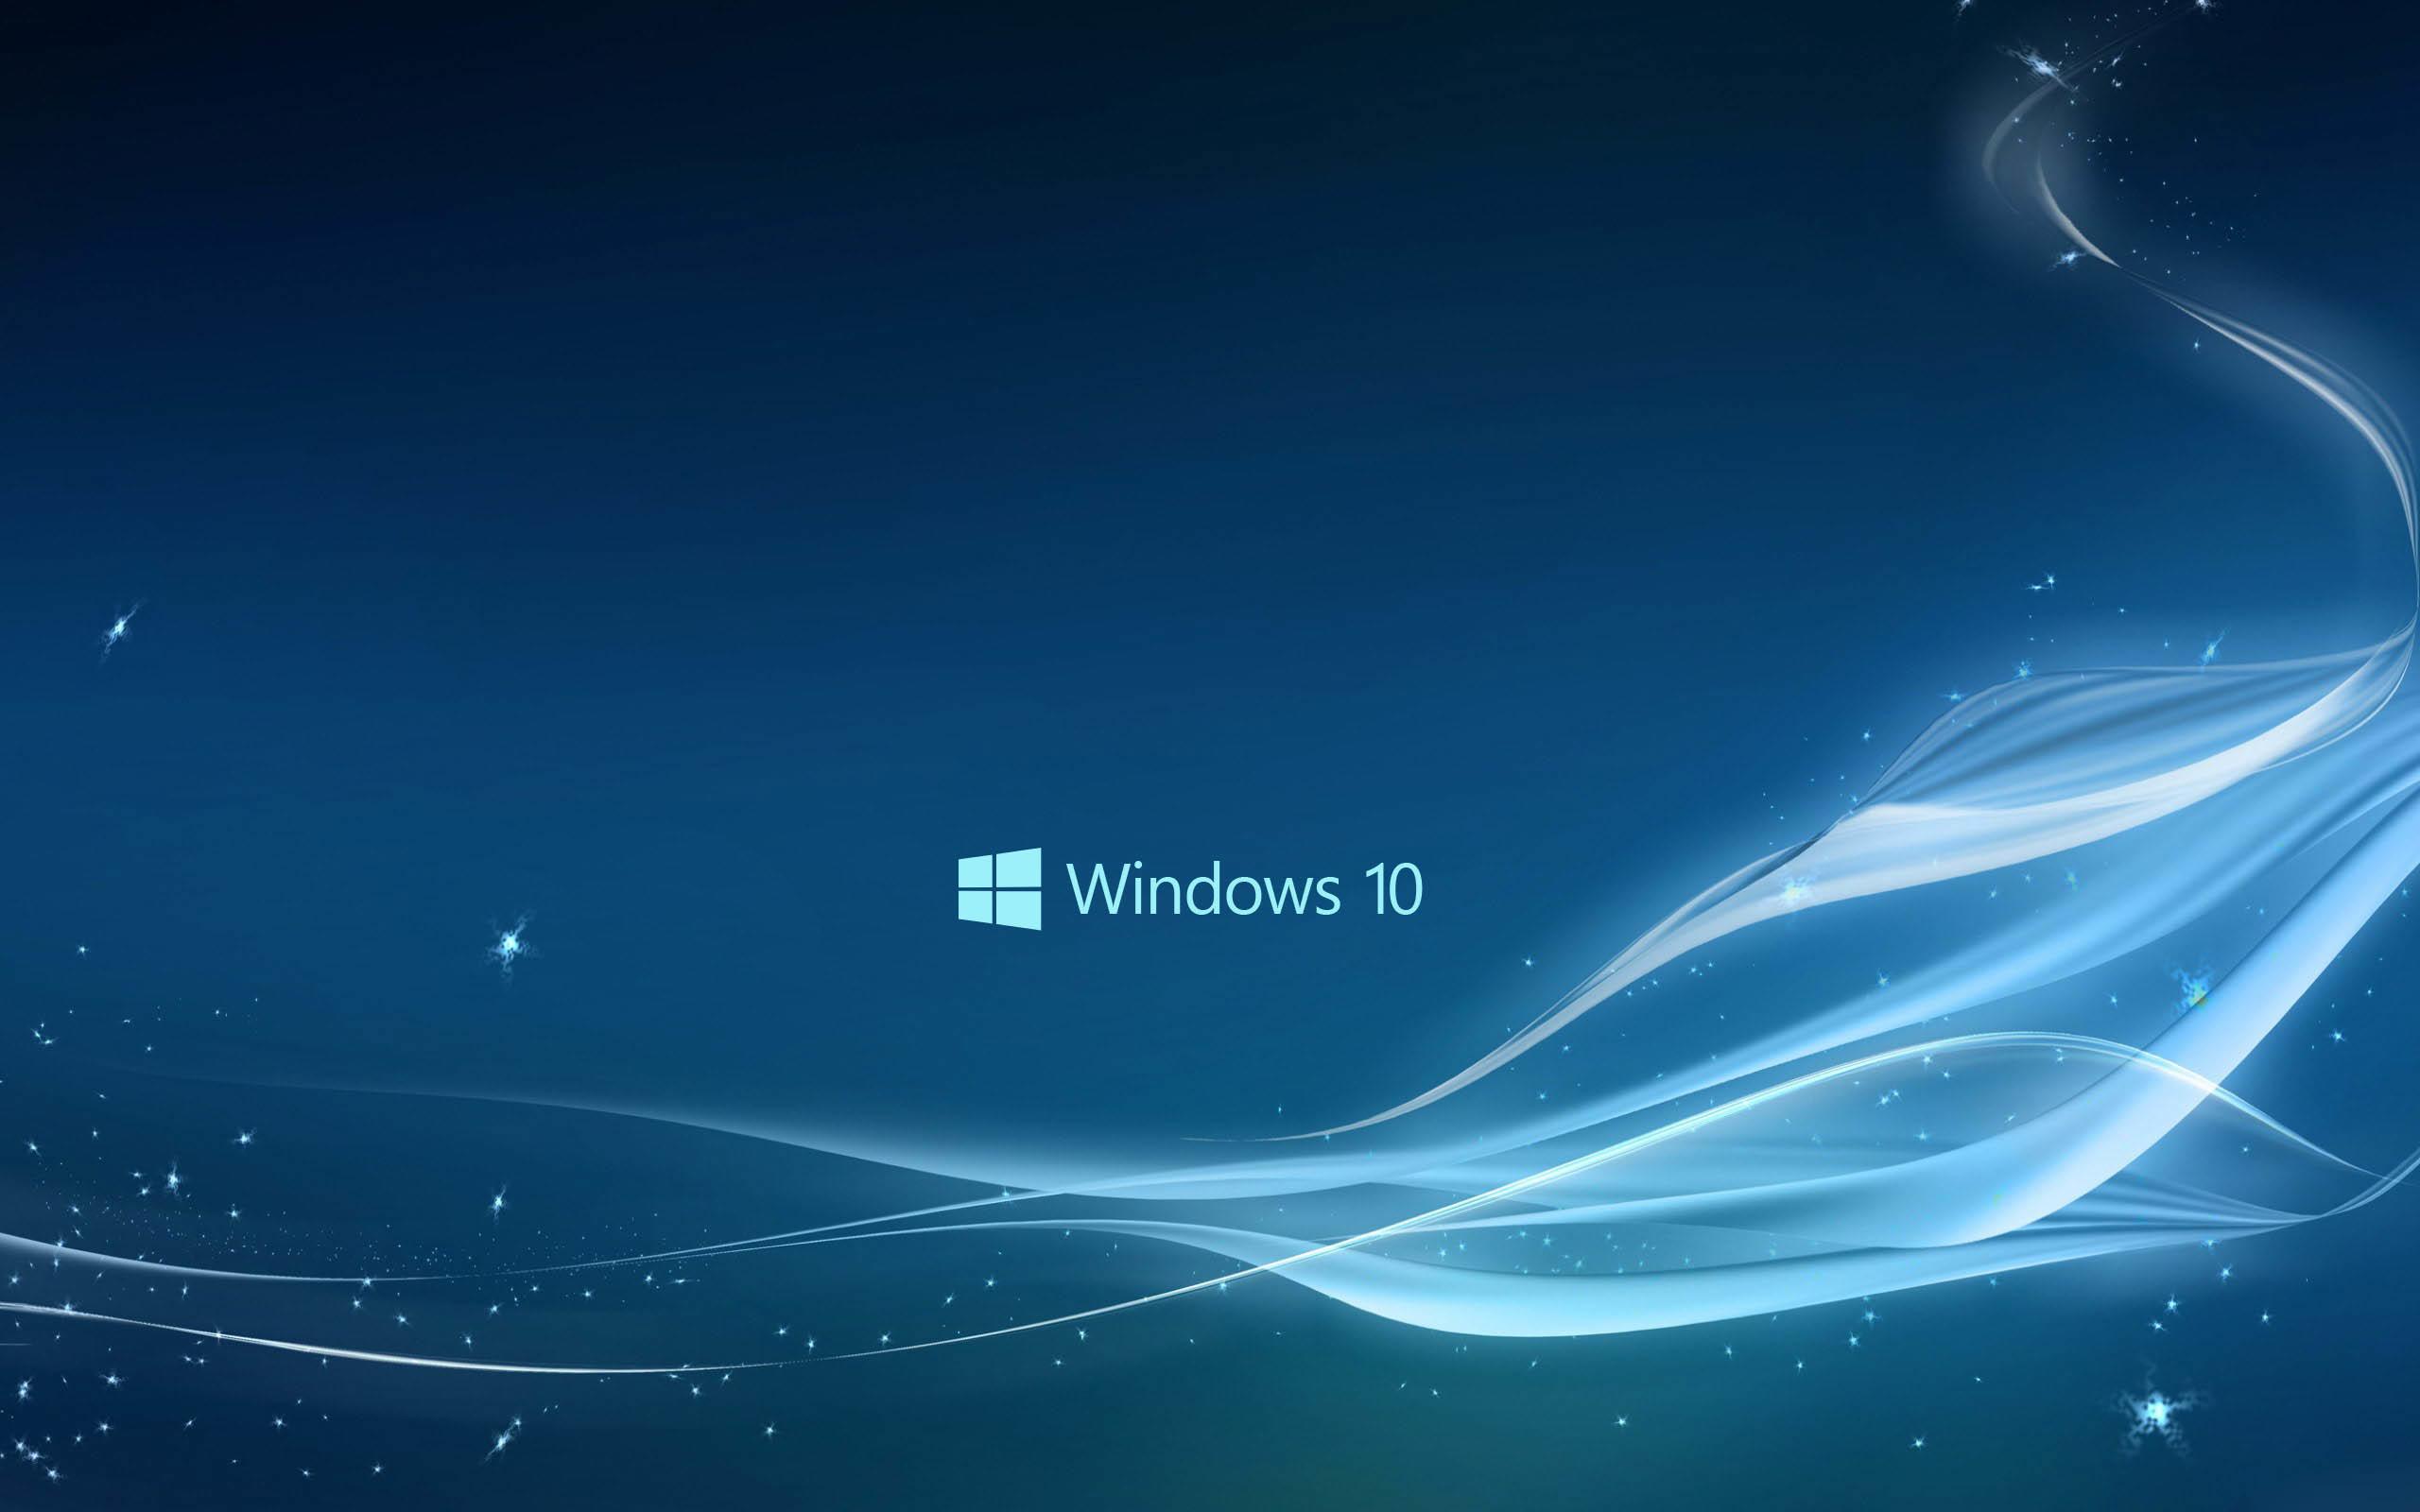 Art Abstract Windows 10 Wallpaper For Computer